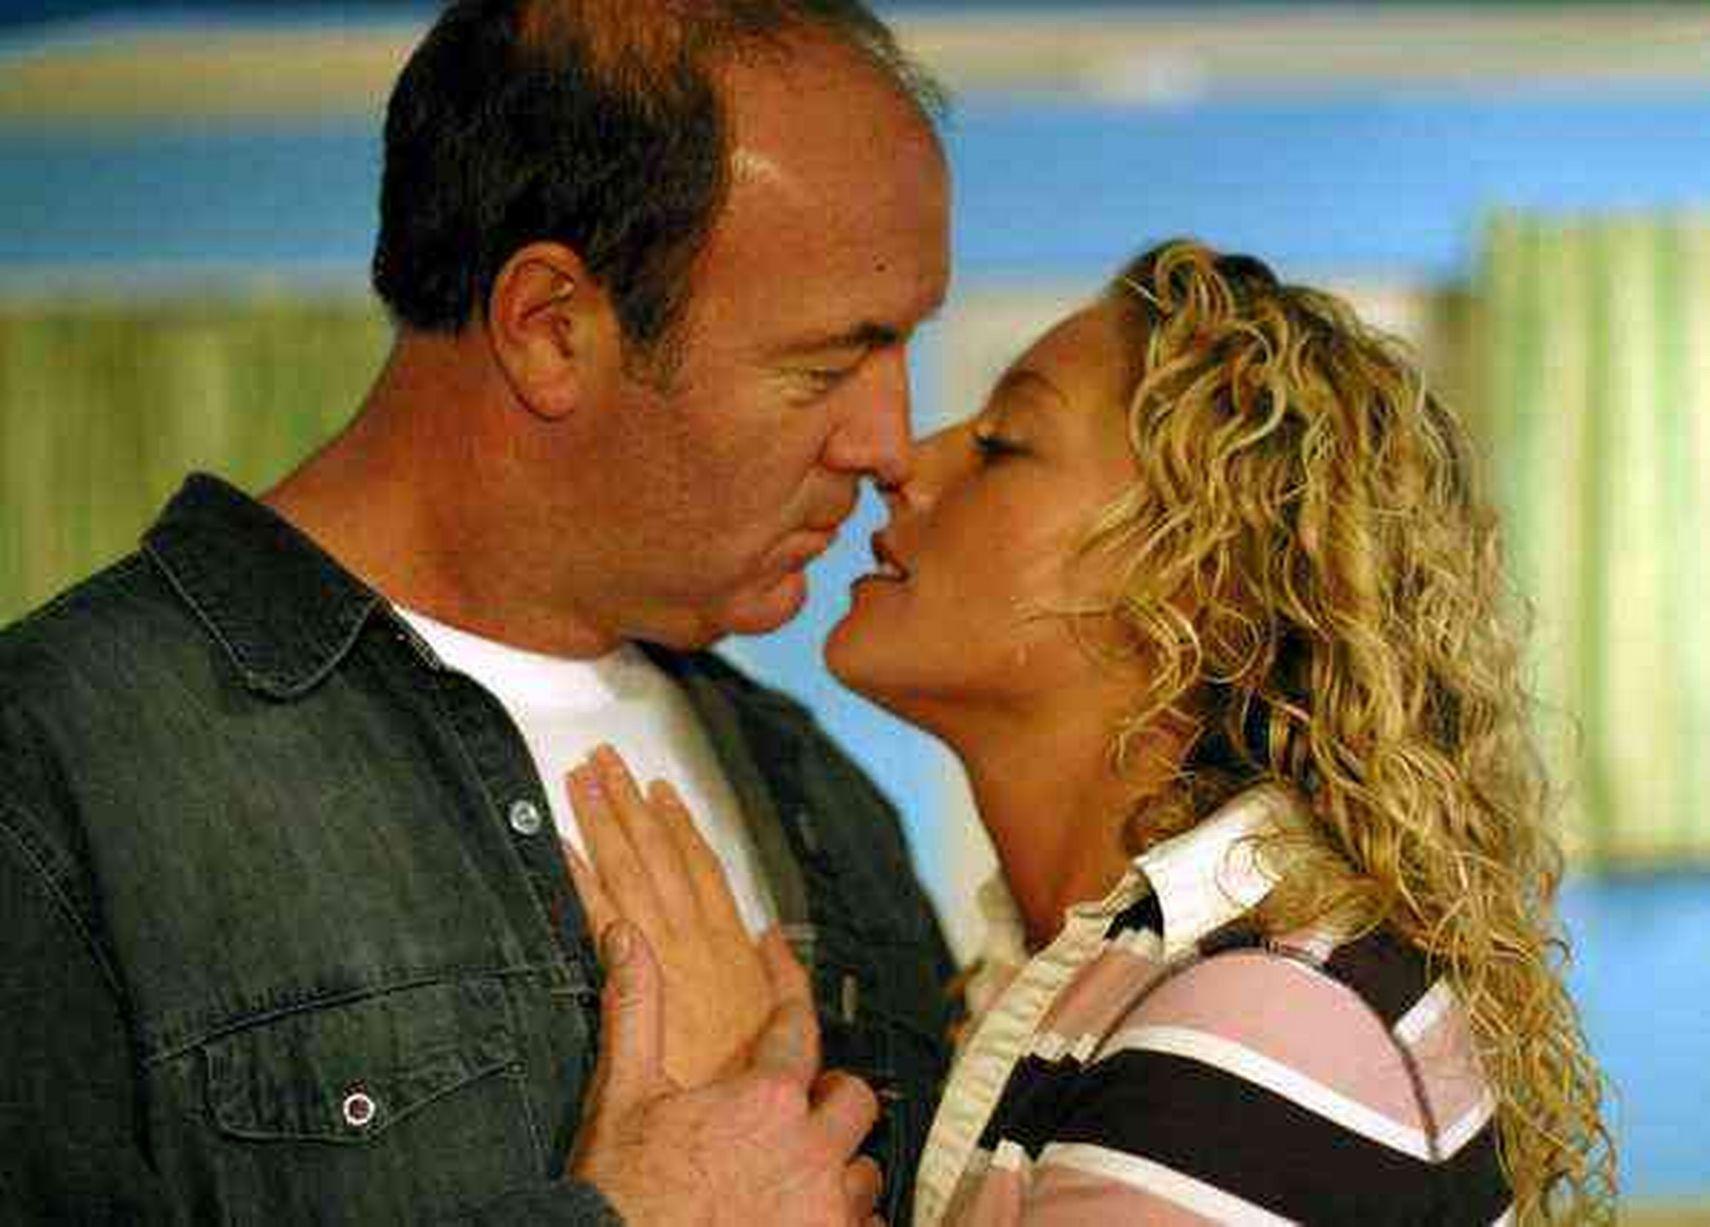 Brookside soap actors dating